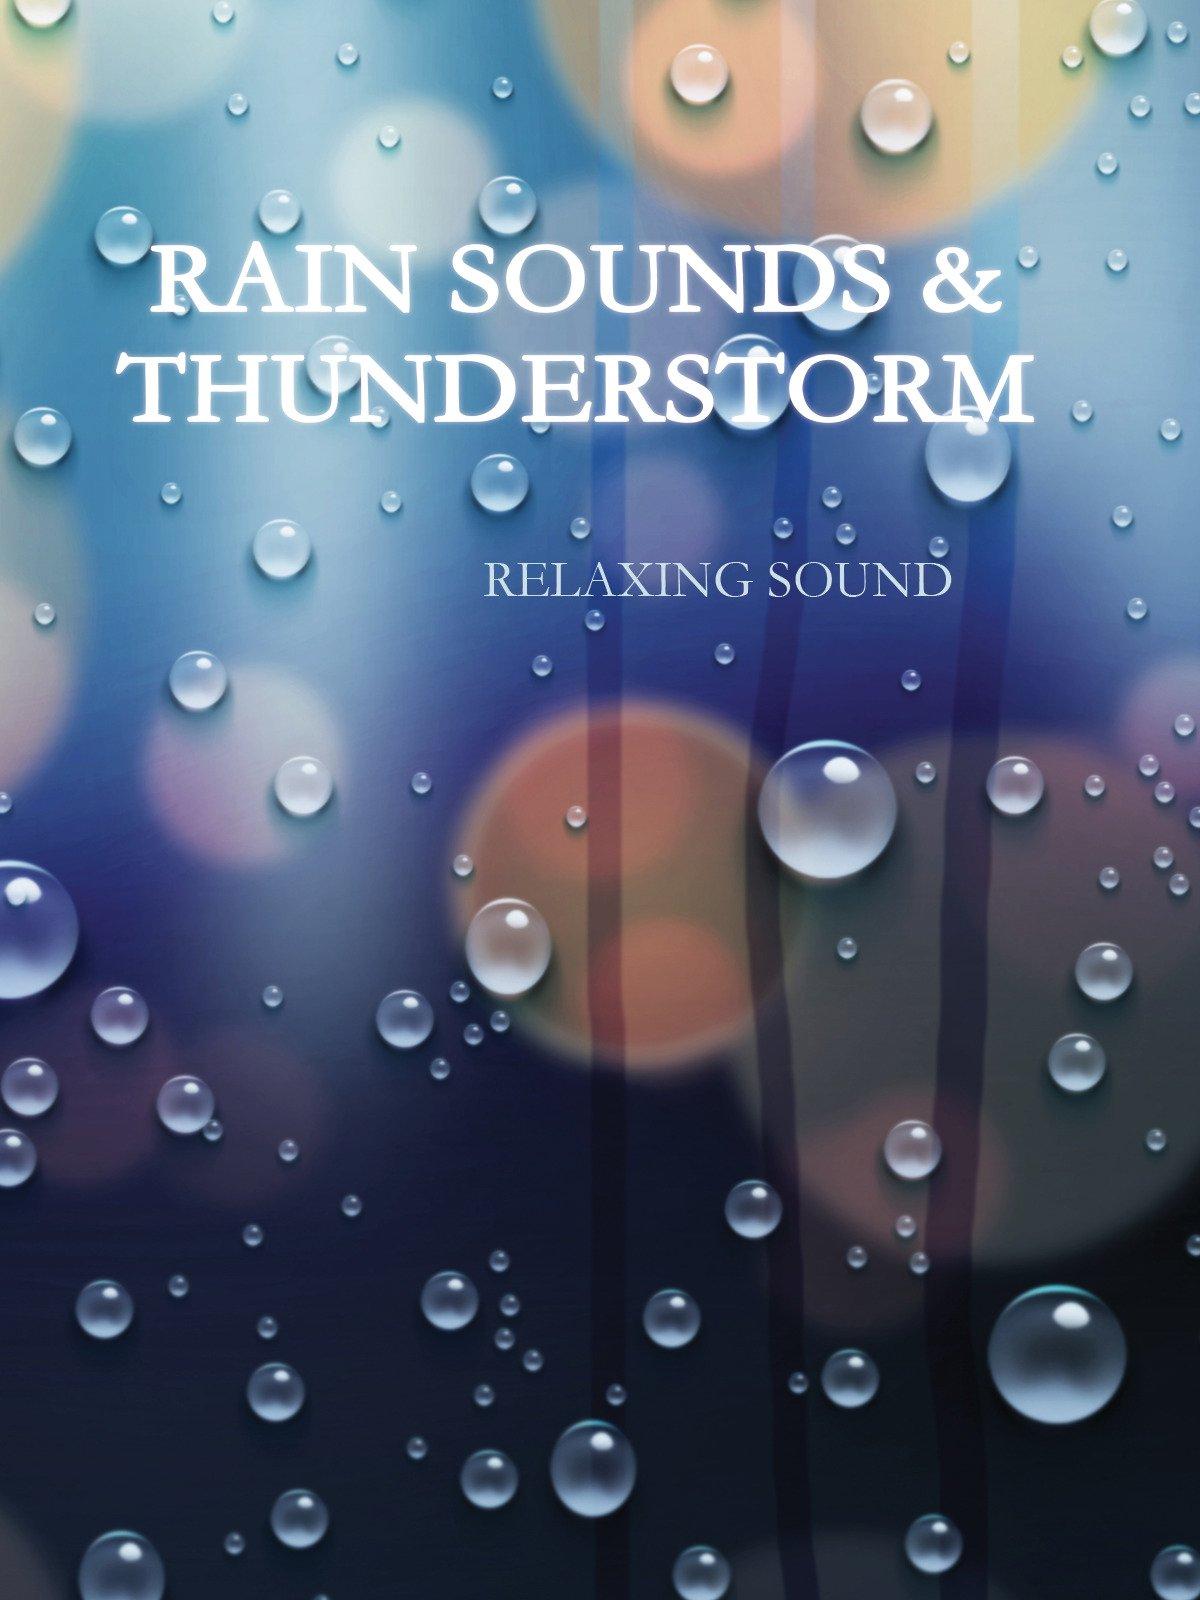 Rain Sounds & Thunderstorm